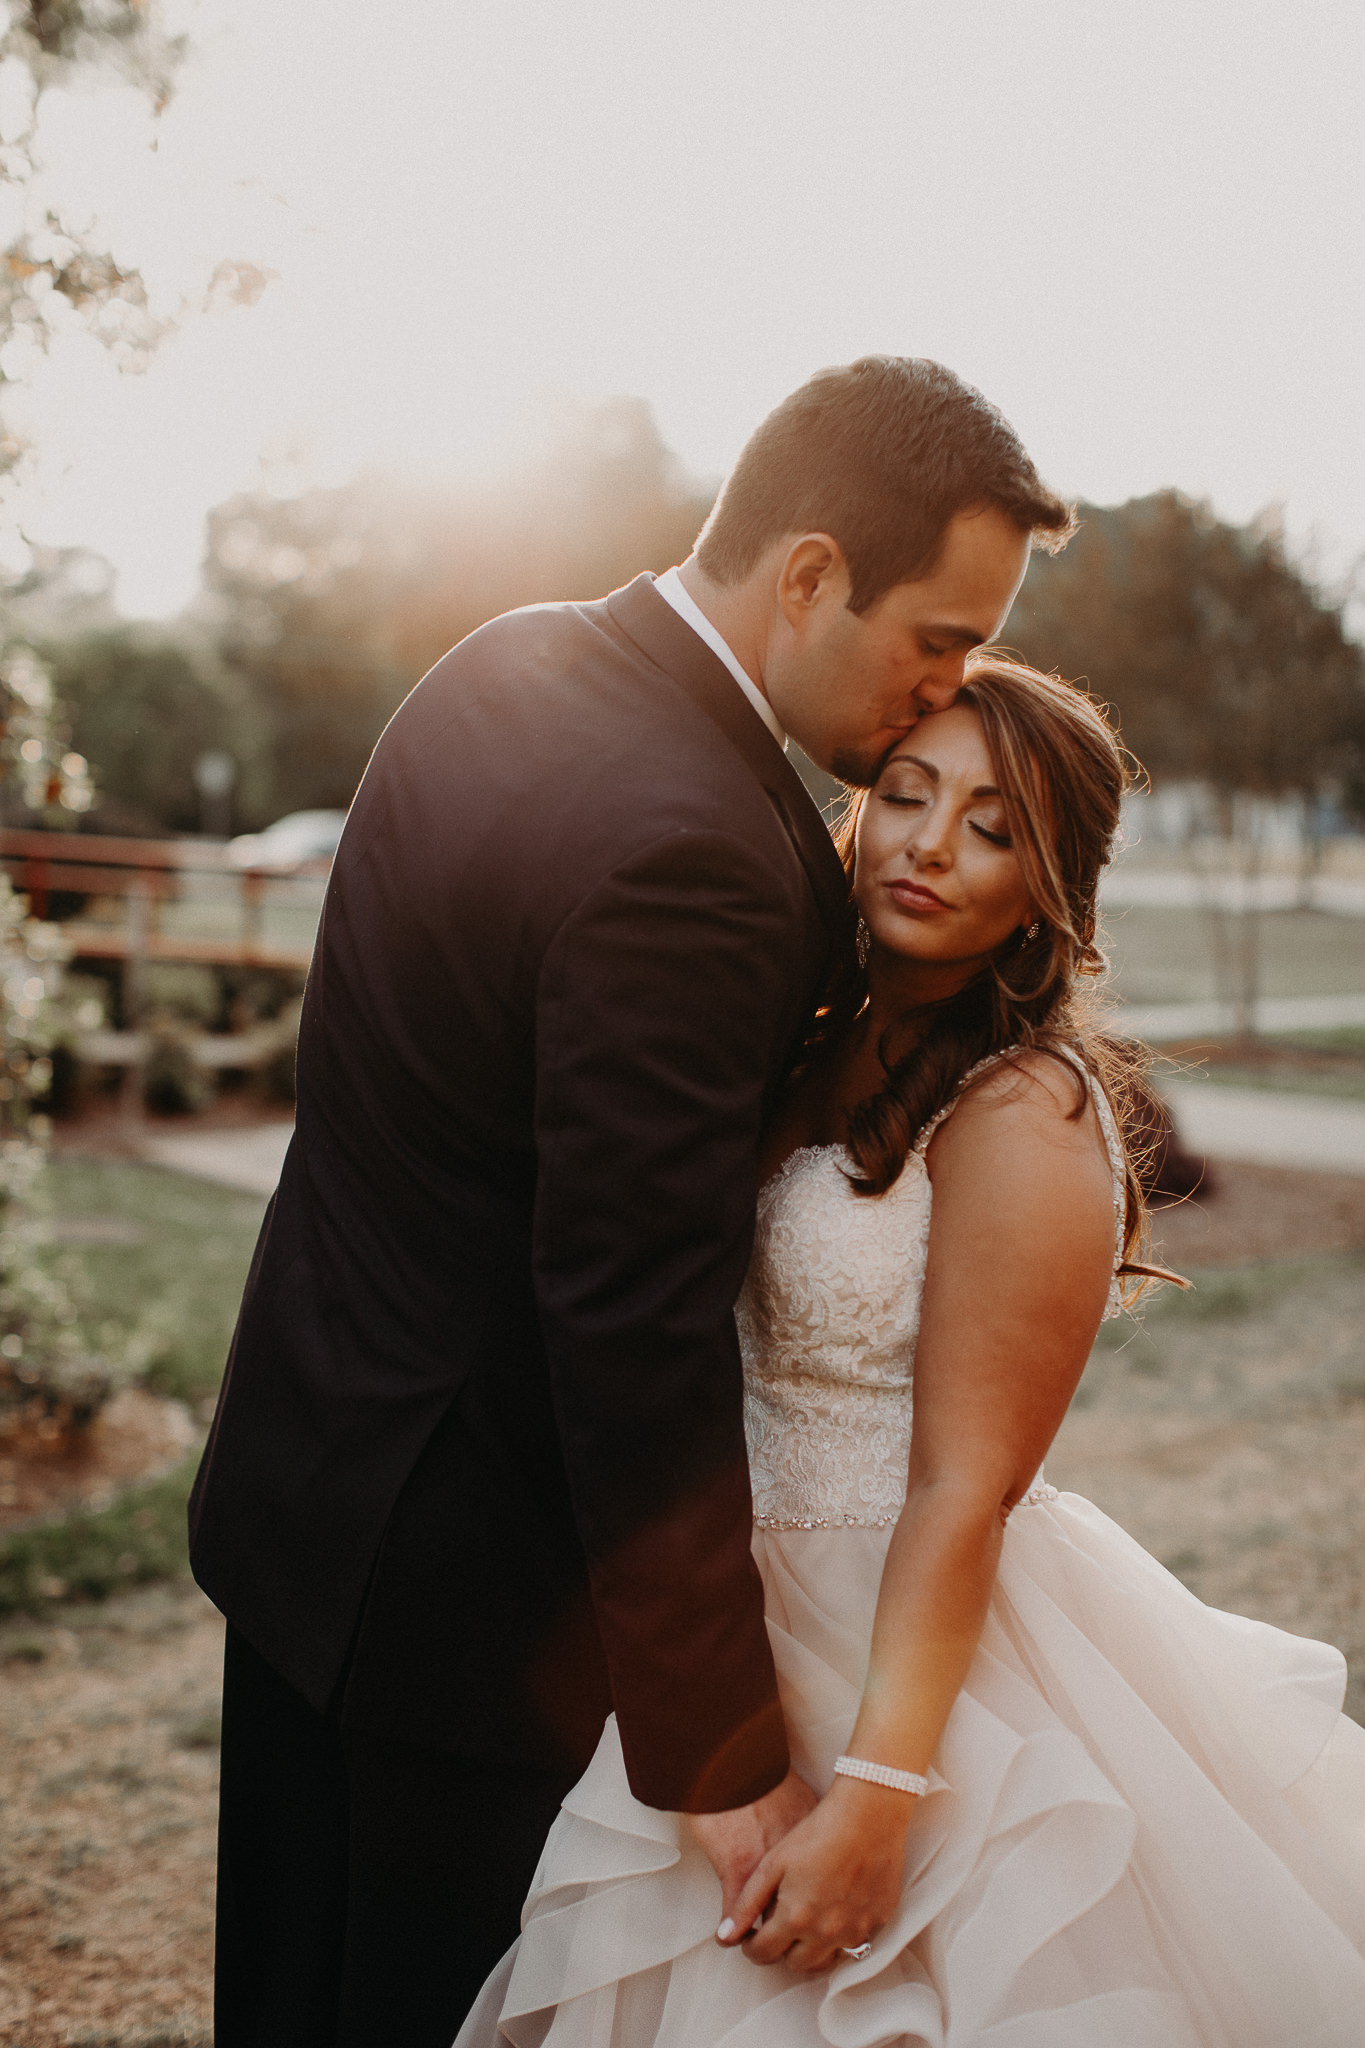 60 - Atlanta Wedding Photographer - The engine room - Ga - Wedding trends - Aline Marin Photography.JPG